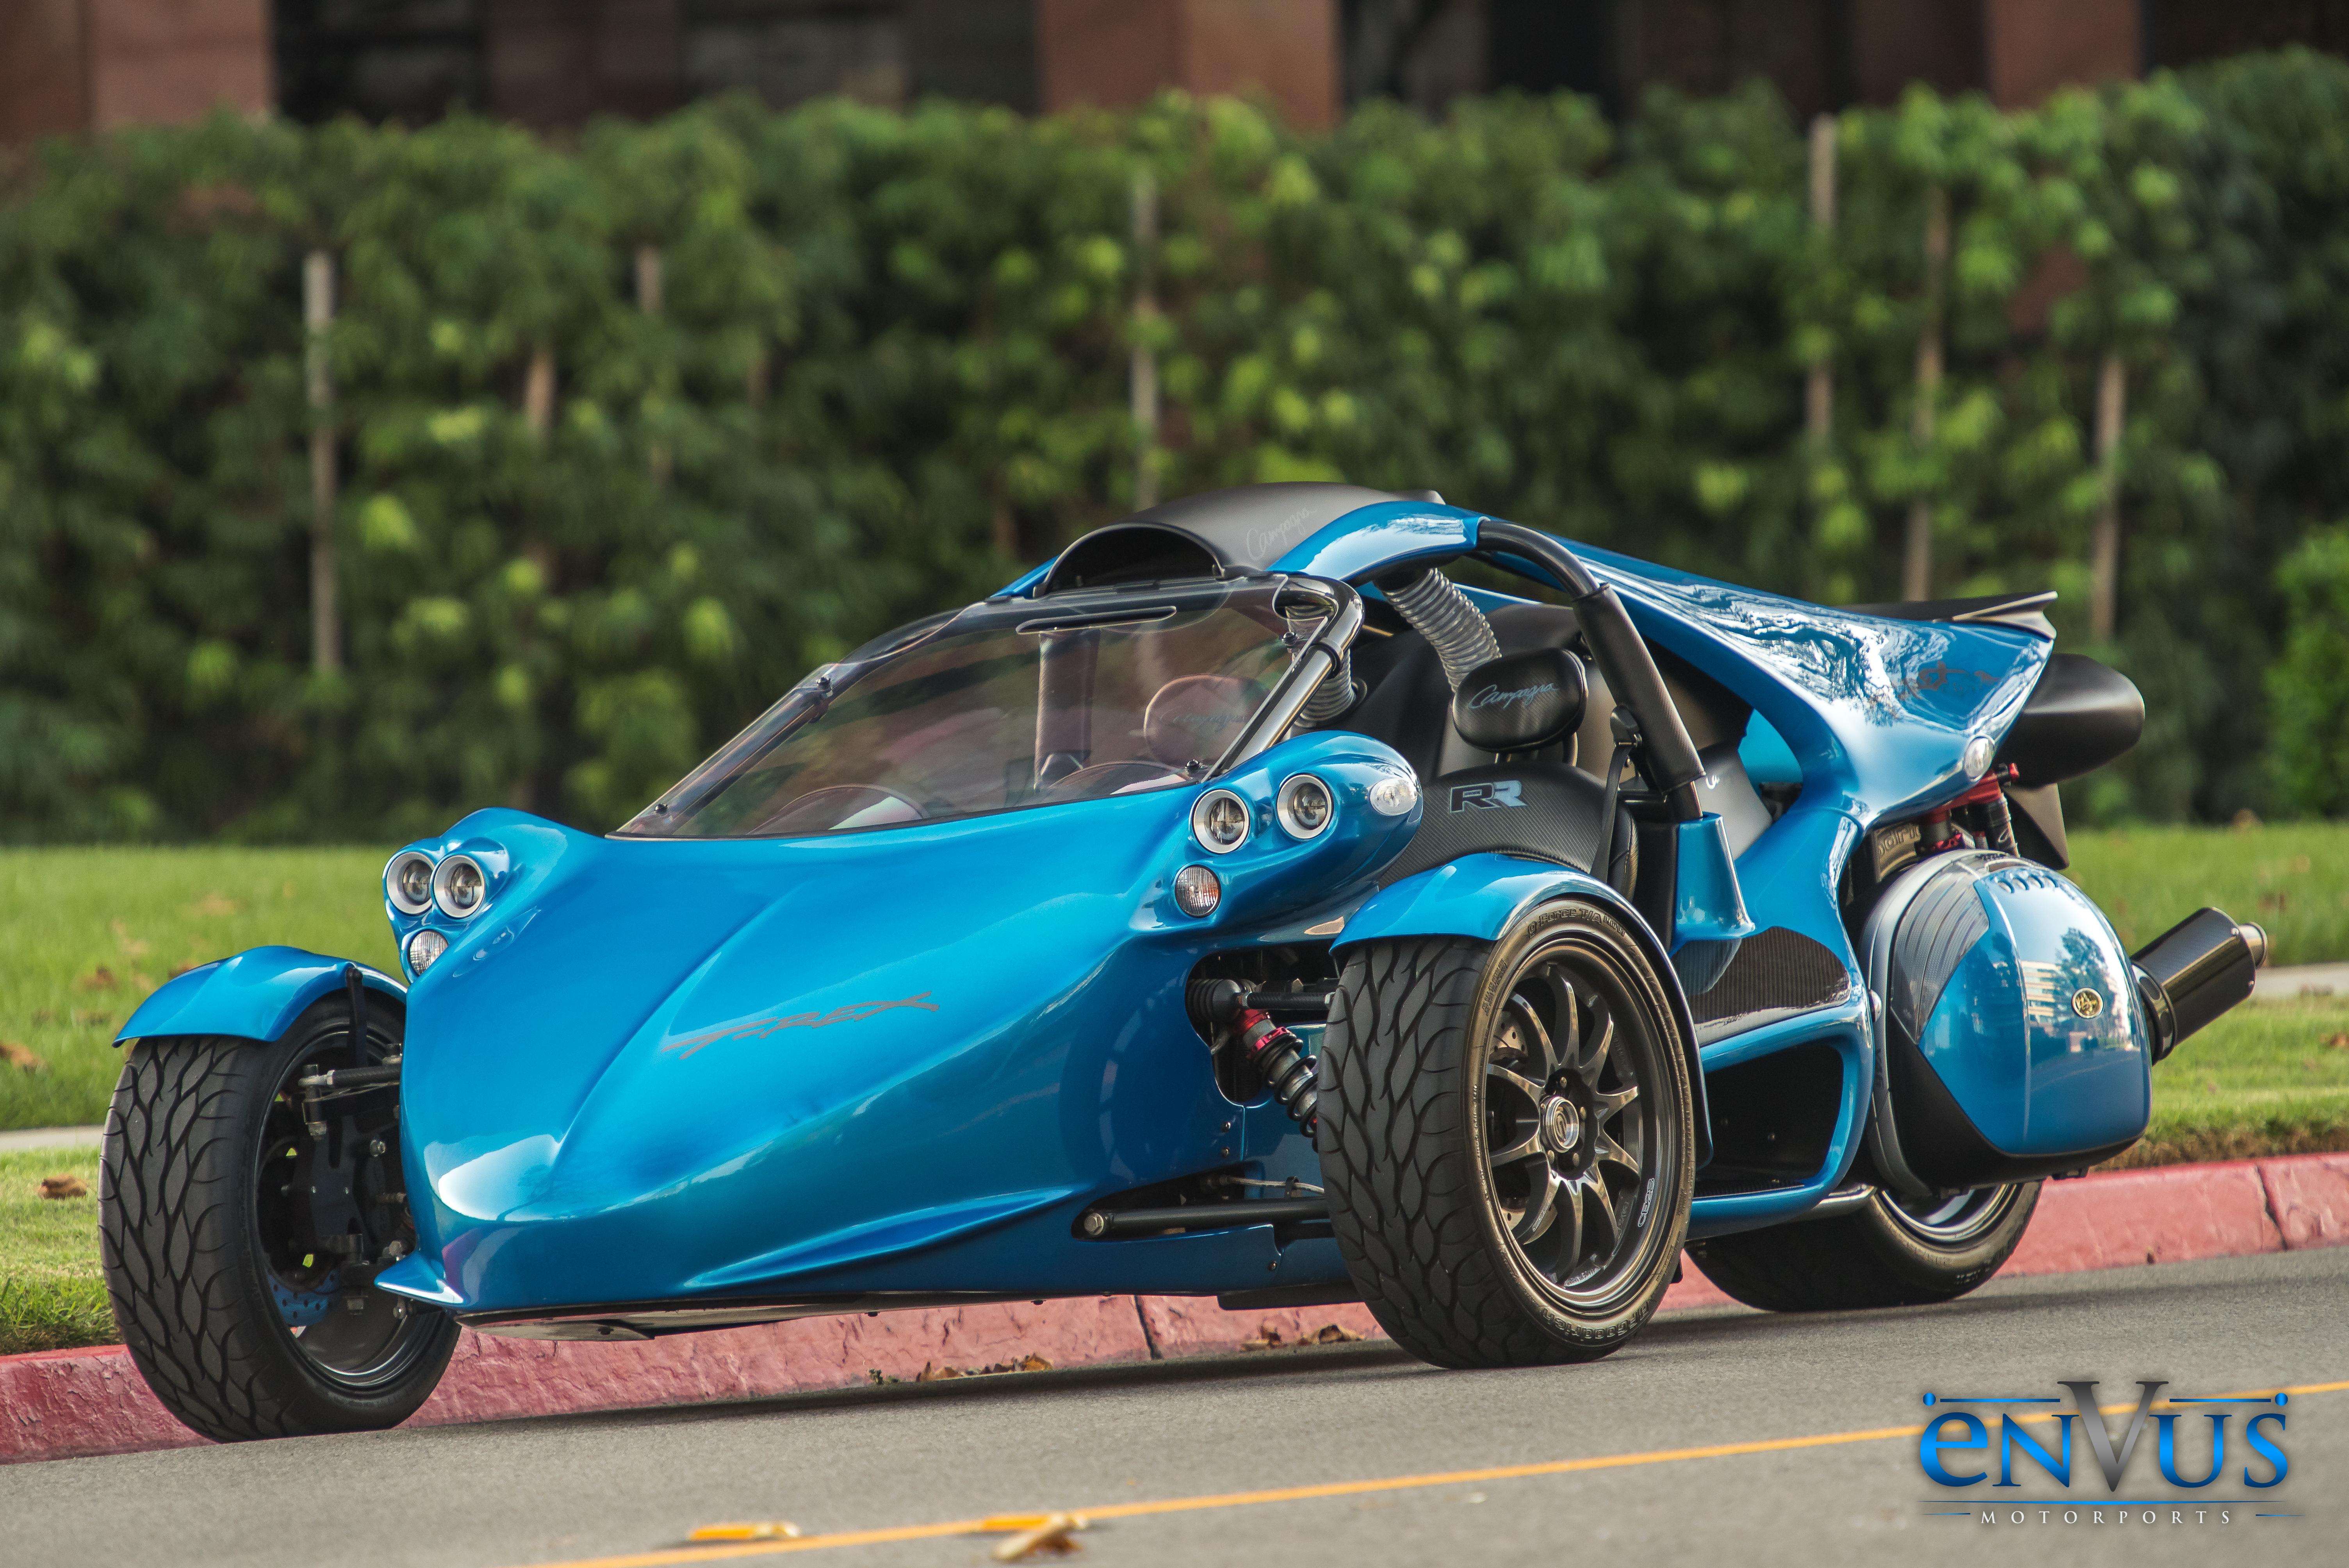 The Campagna T Rex A Fantastic Vehicle To Drive enVus Motorsports